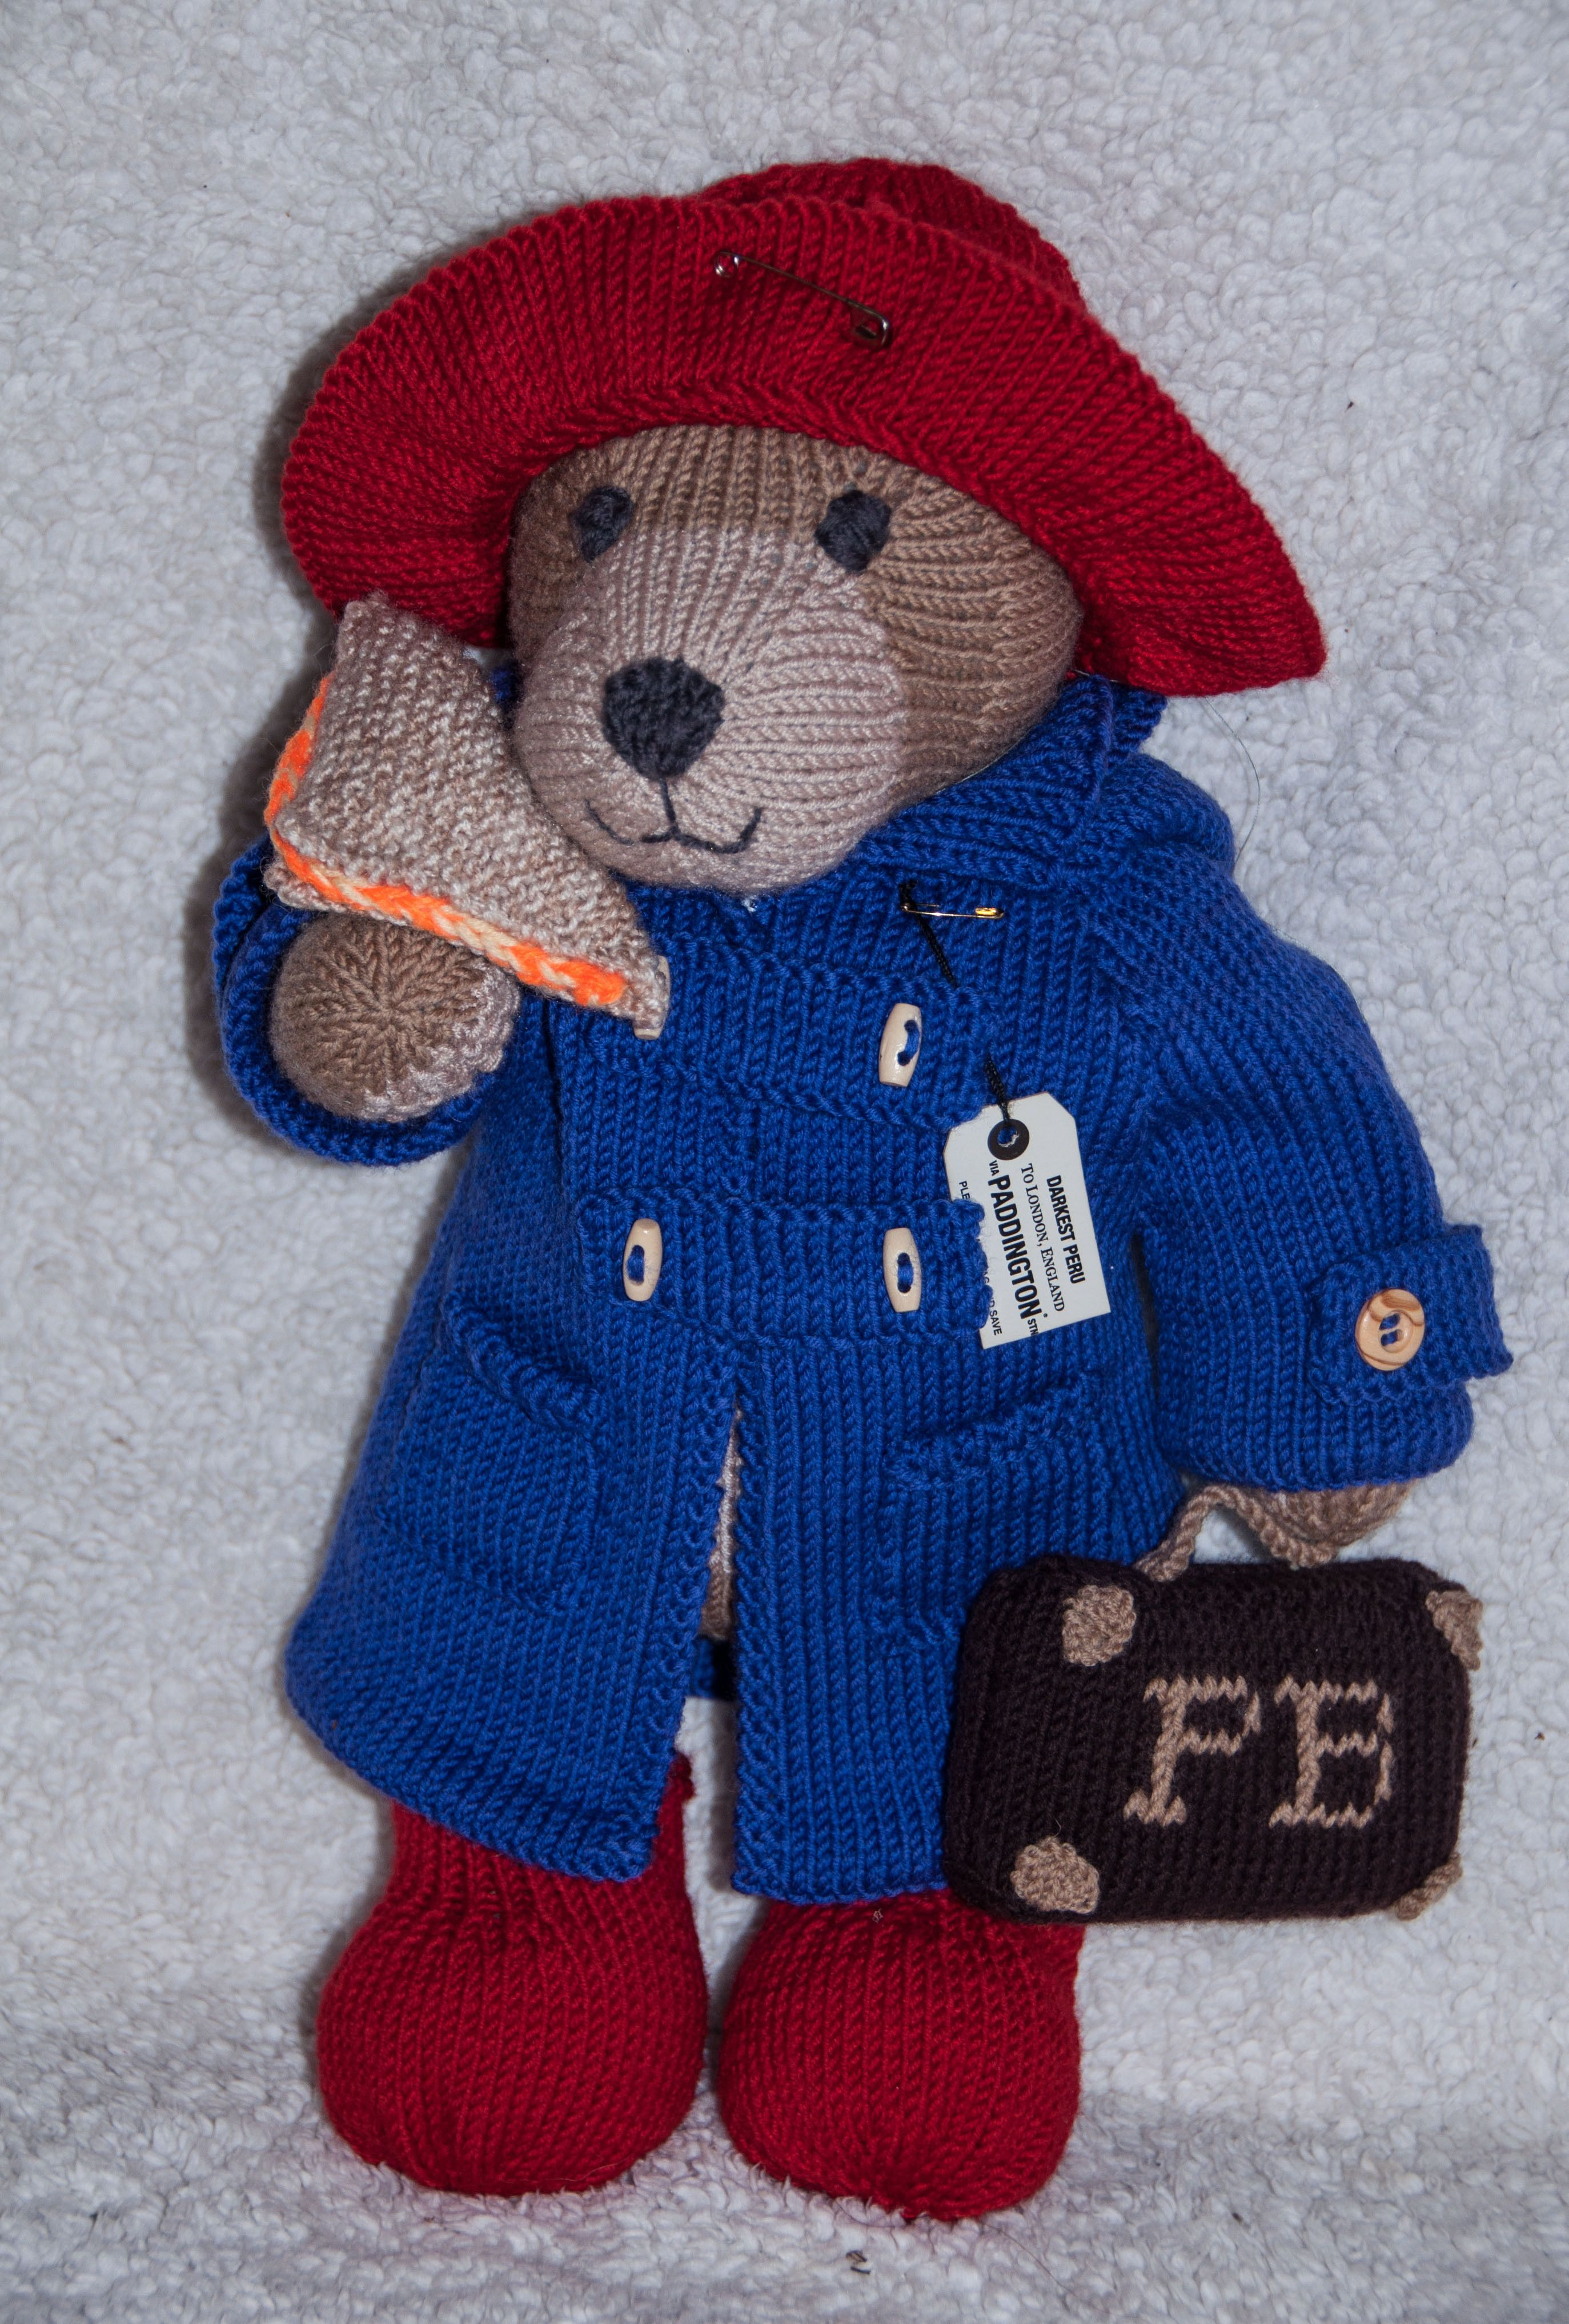 Paddington Bear knitting project by Cheryl M | Baby toys | Pinterest ...